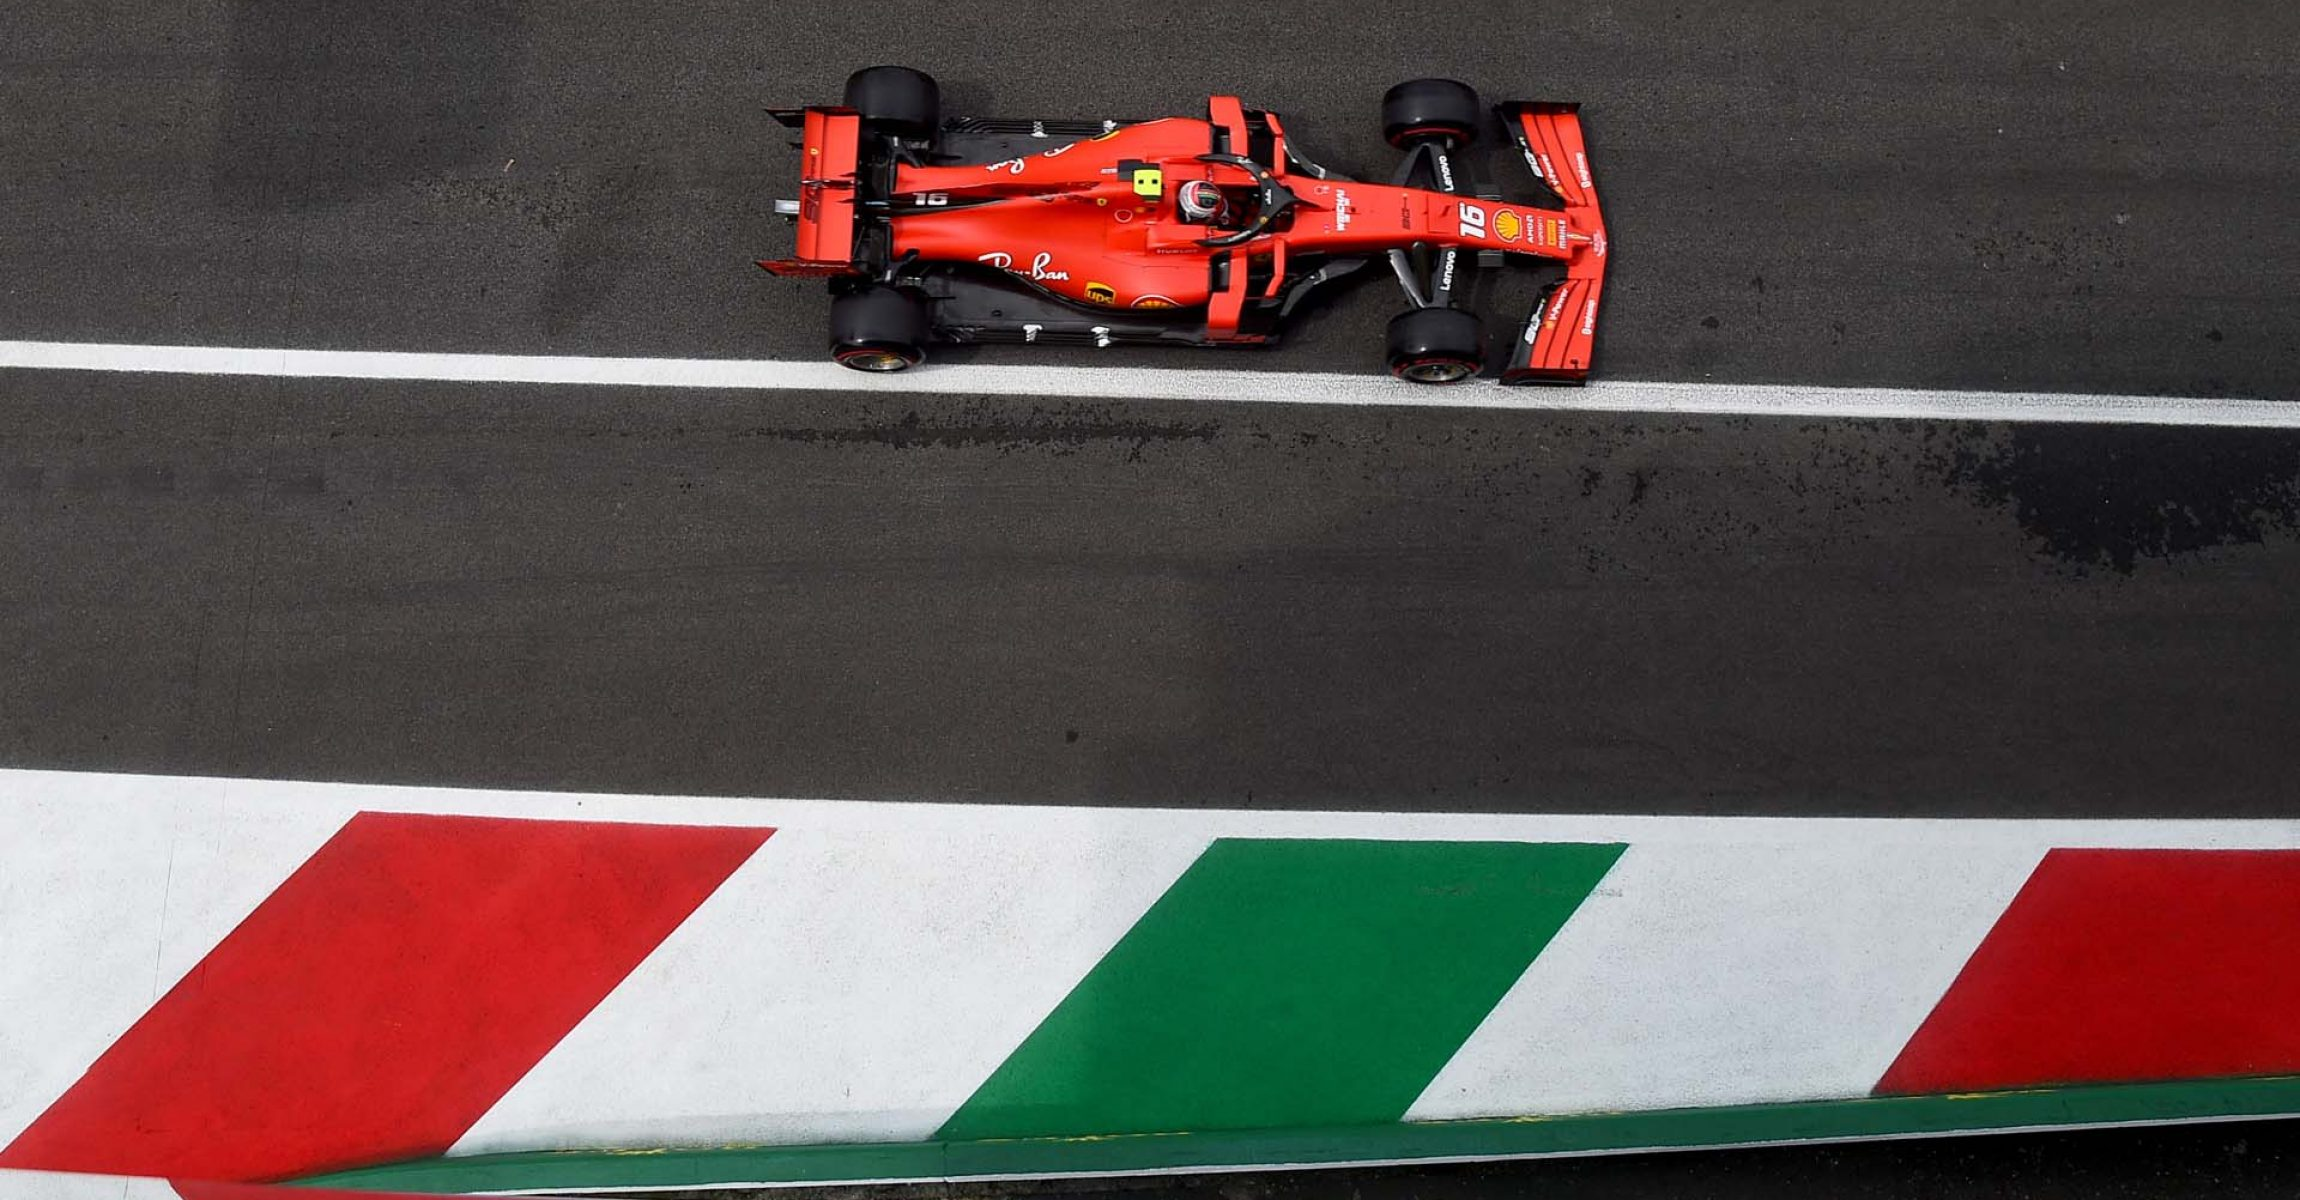 Charles Leclerc, Ferrari, Italian Grand Prix 2019, Monza, Saturday